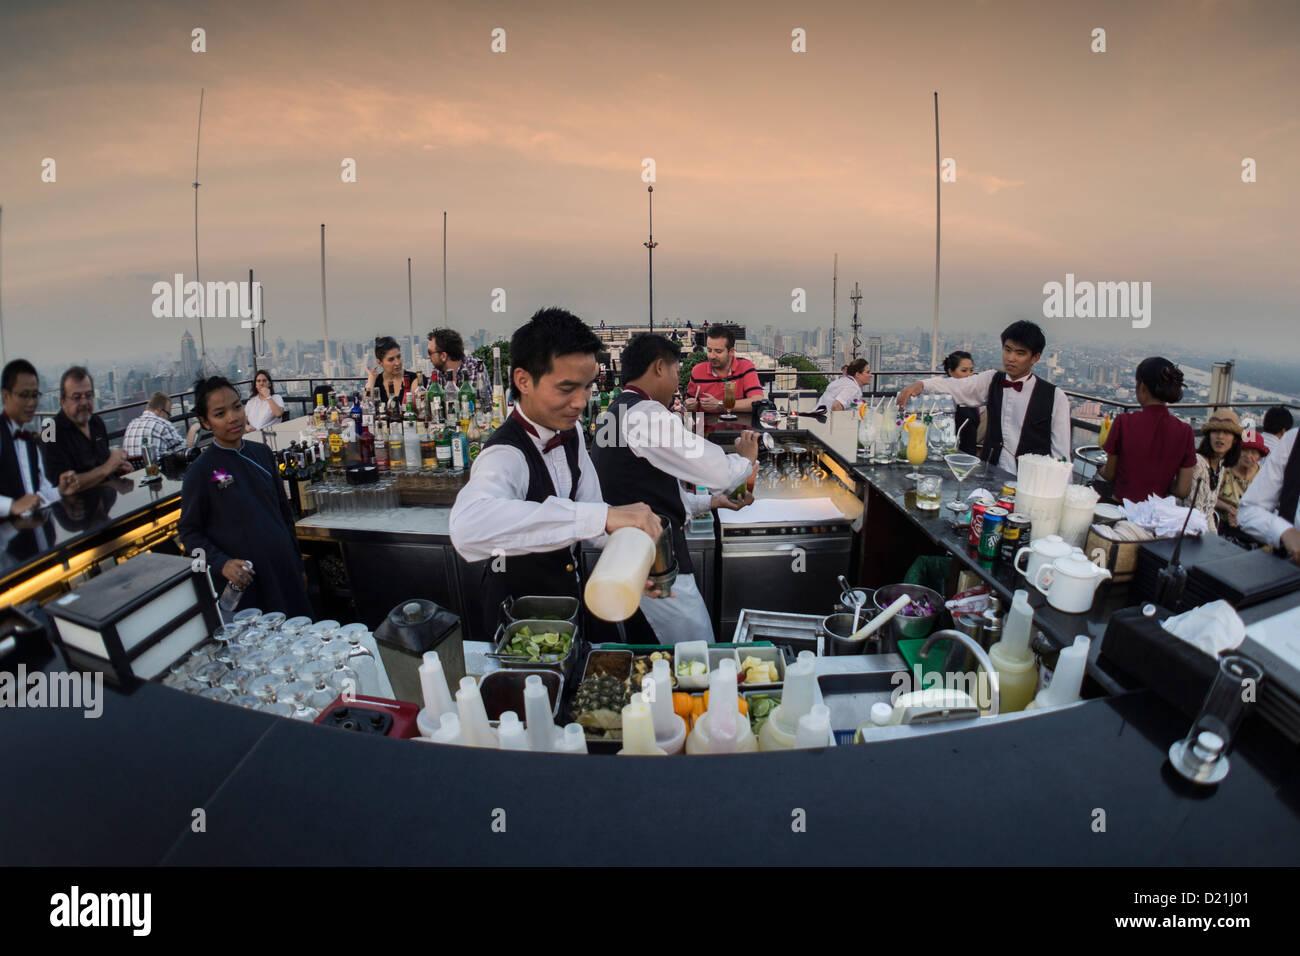 Rooftop of the Banyan Tree Hotel, Vertigo Bar Restaurant and Moon Bar, Bangkok, Thailand - Stock Image